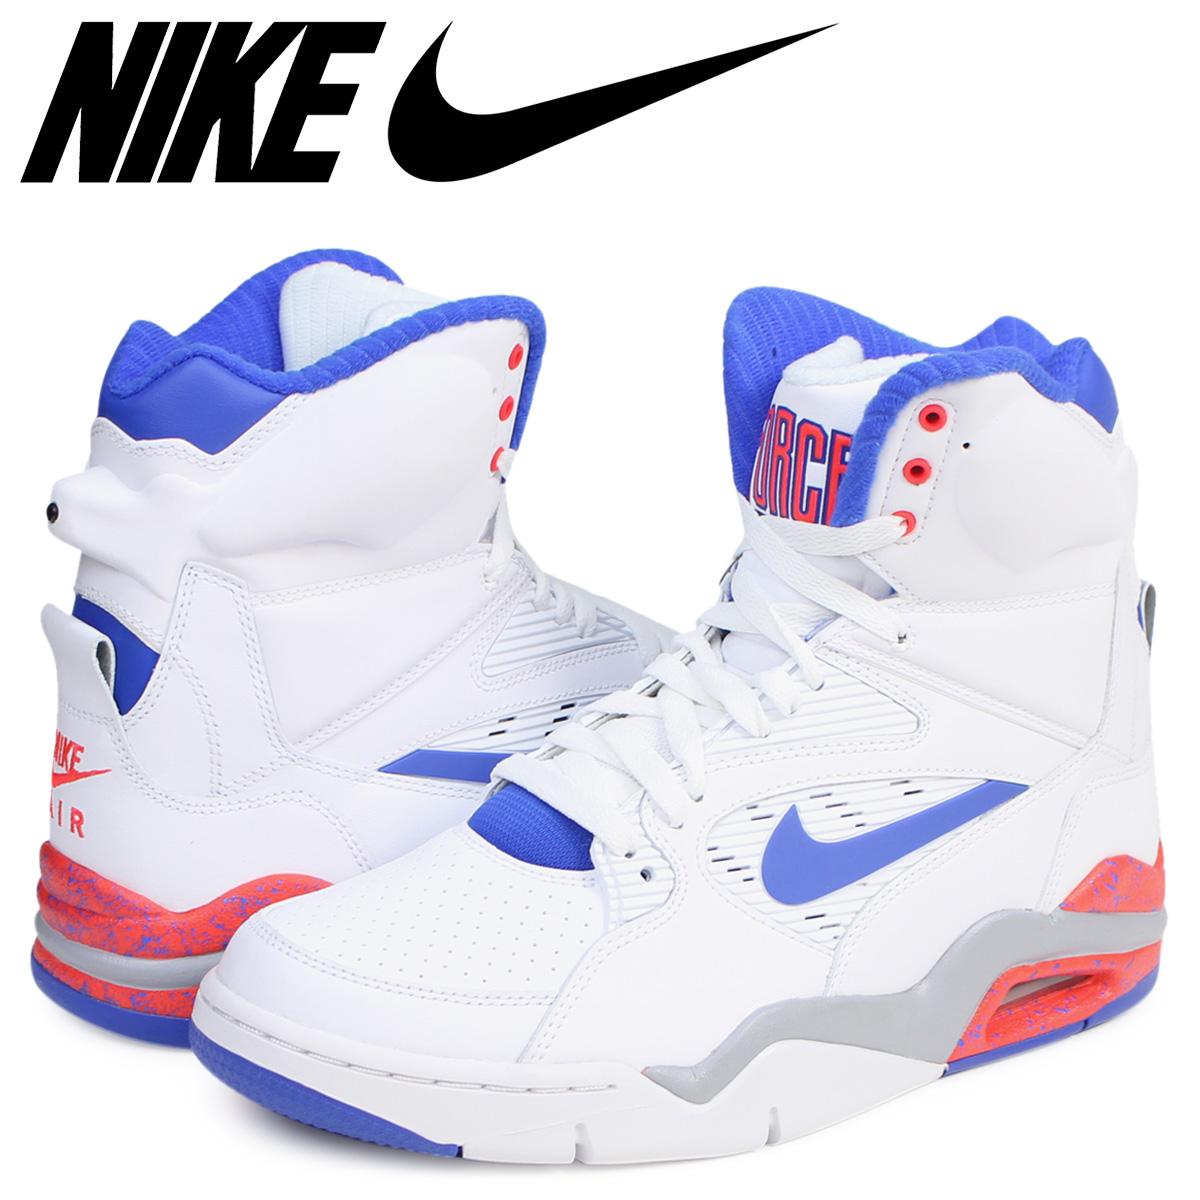 free shipping f24a4 e4352 Nike NIKE air command force sneakers AIR COMMAND FORCE 684,715-101 men s  shoes ultramarine blue white  7 6 Shinnyu load